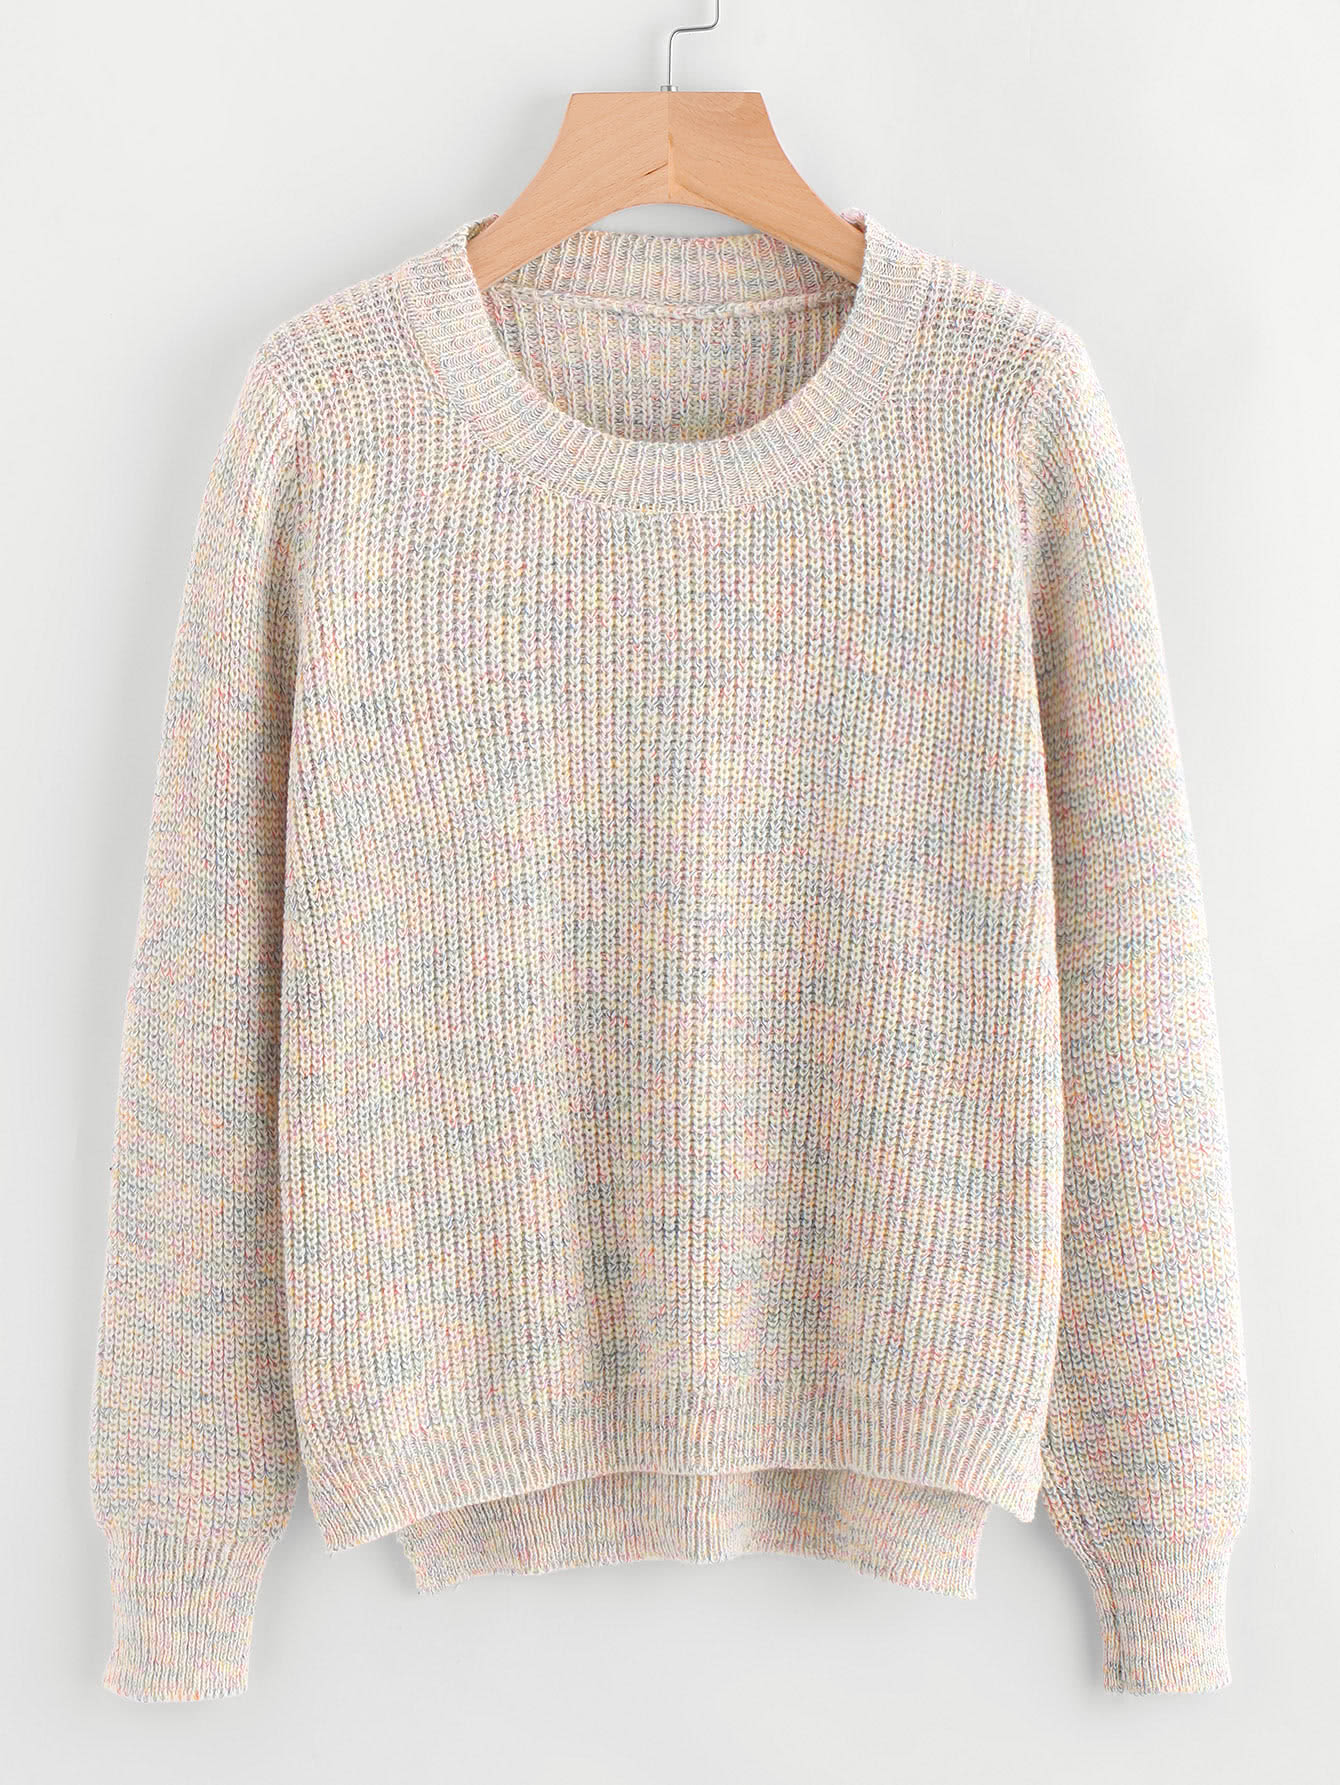 Dip Hem Textured Knit Sweater